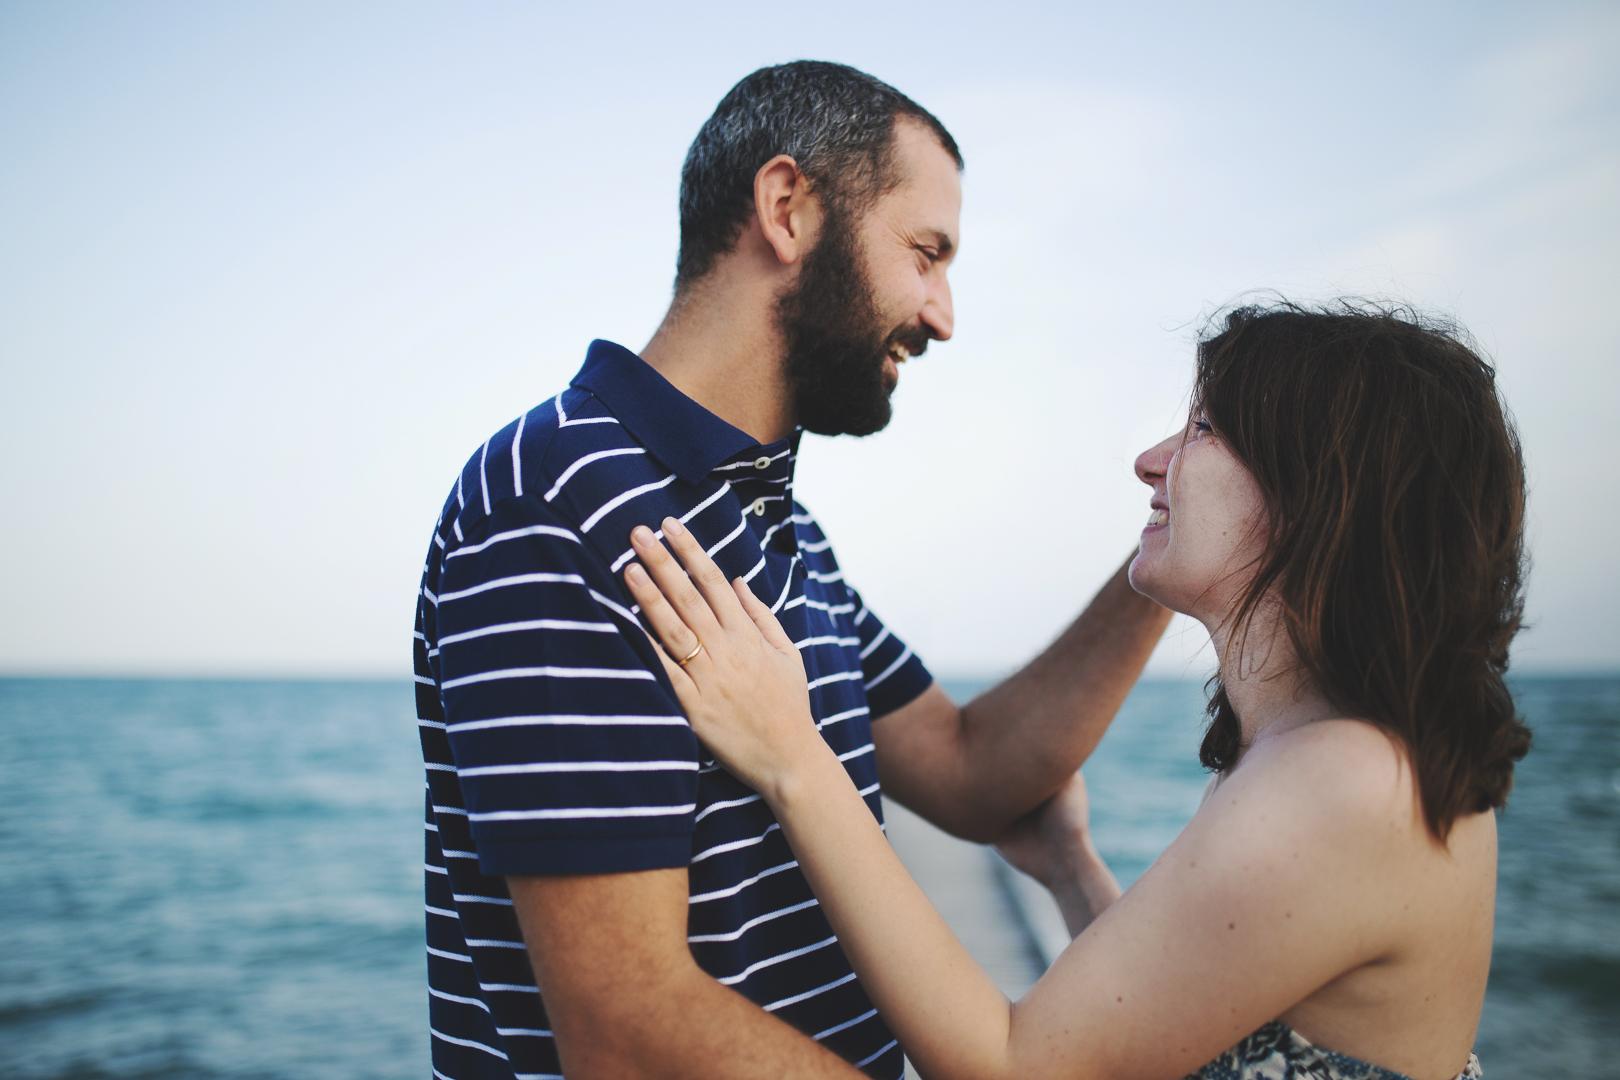 fotografa gravidanza treviso